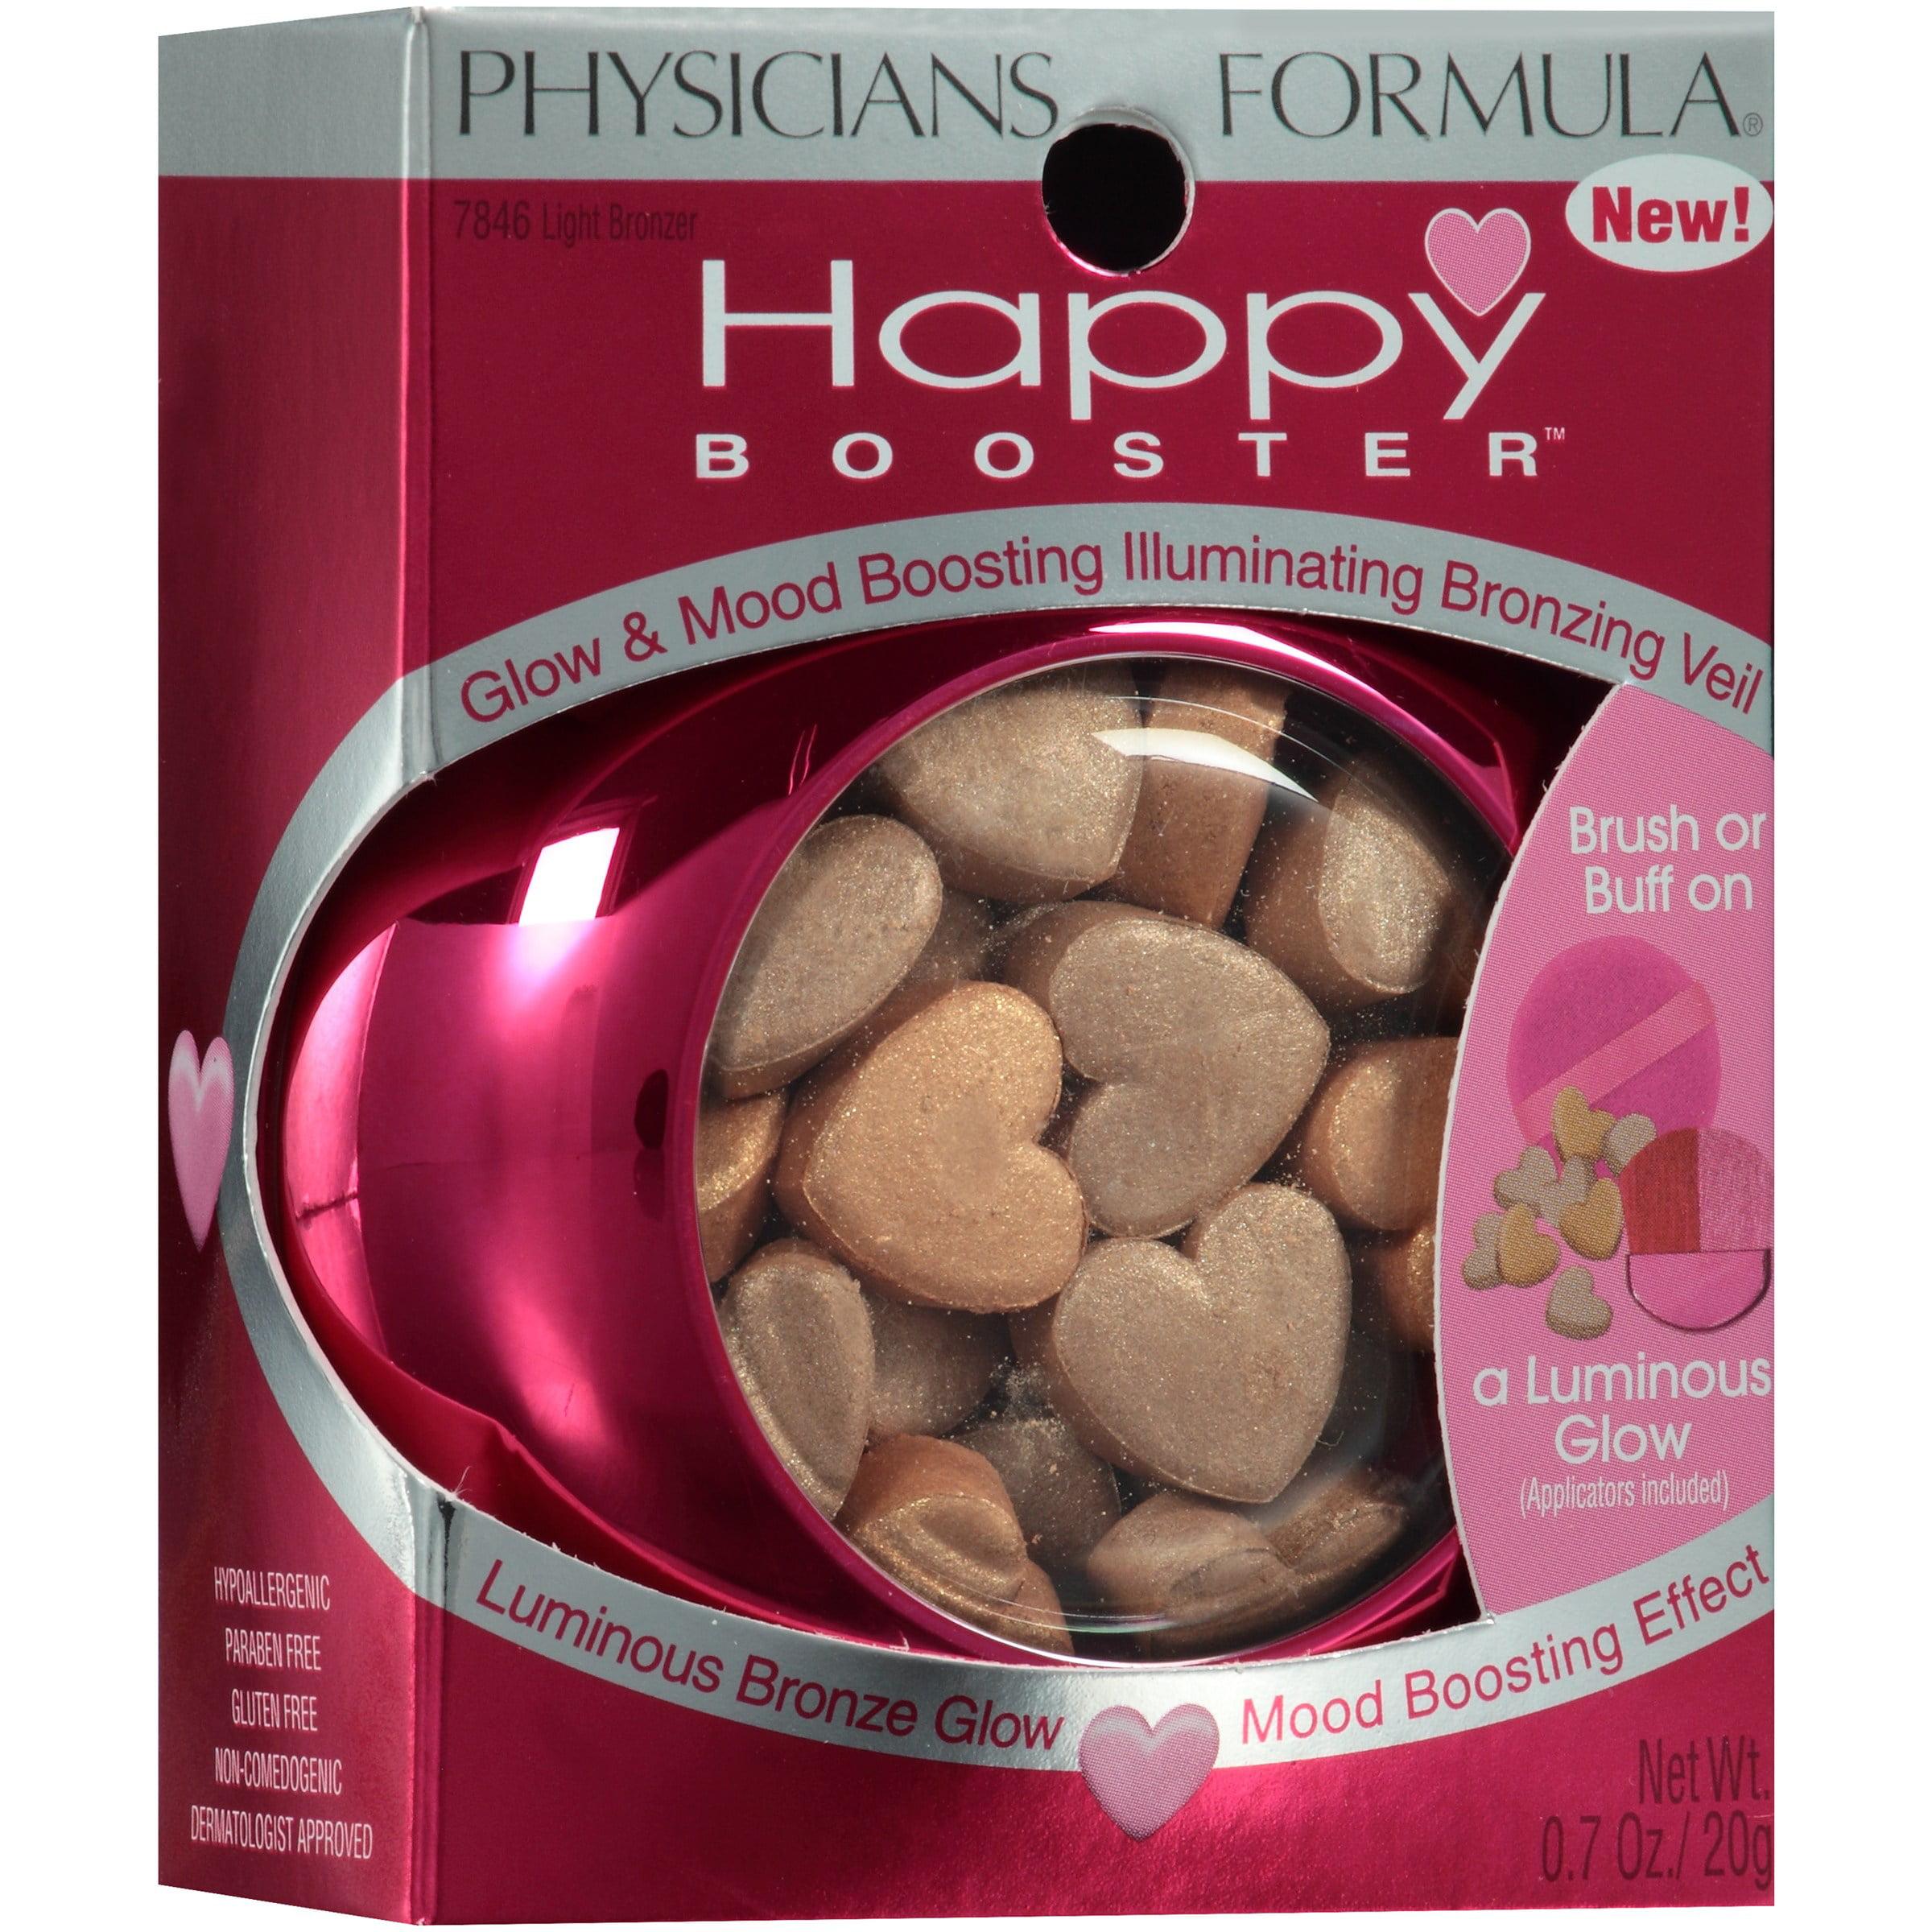 Physicians Formula Happy Booster 2 Light Bronzer Glow & Mood Boosting Illuminating Bronzing Veil 0.7 oz. Box